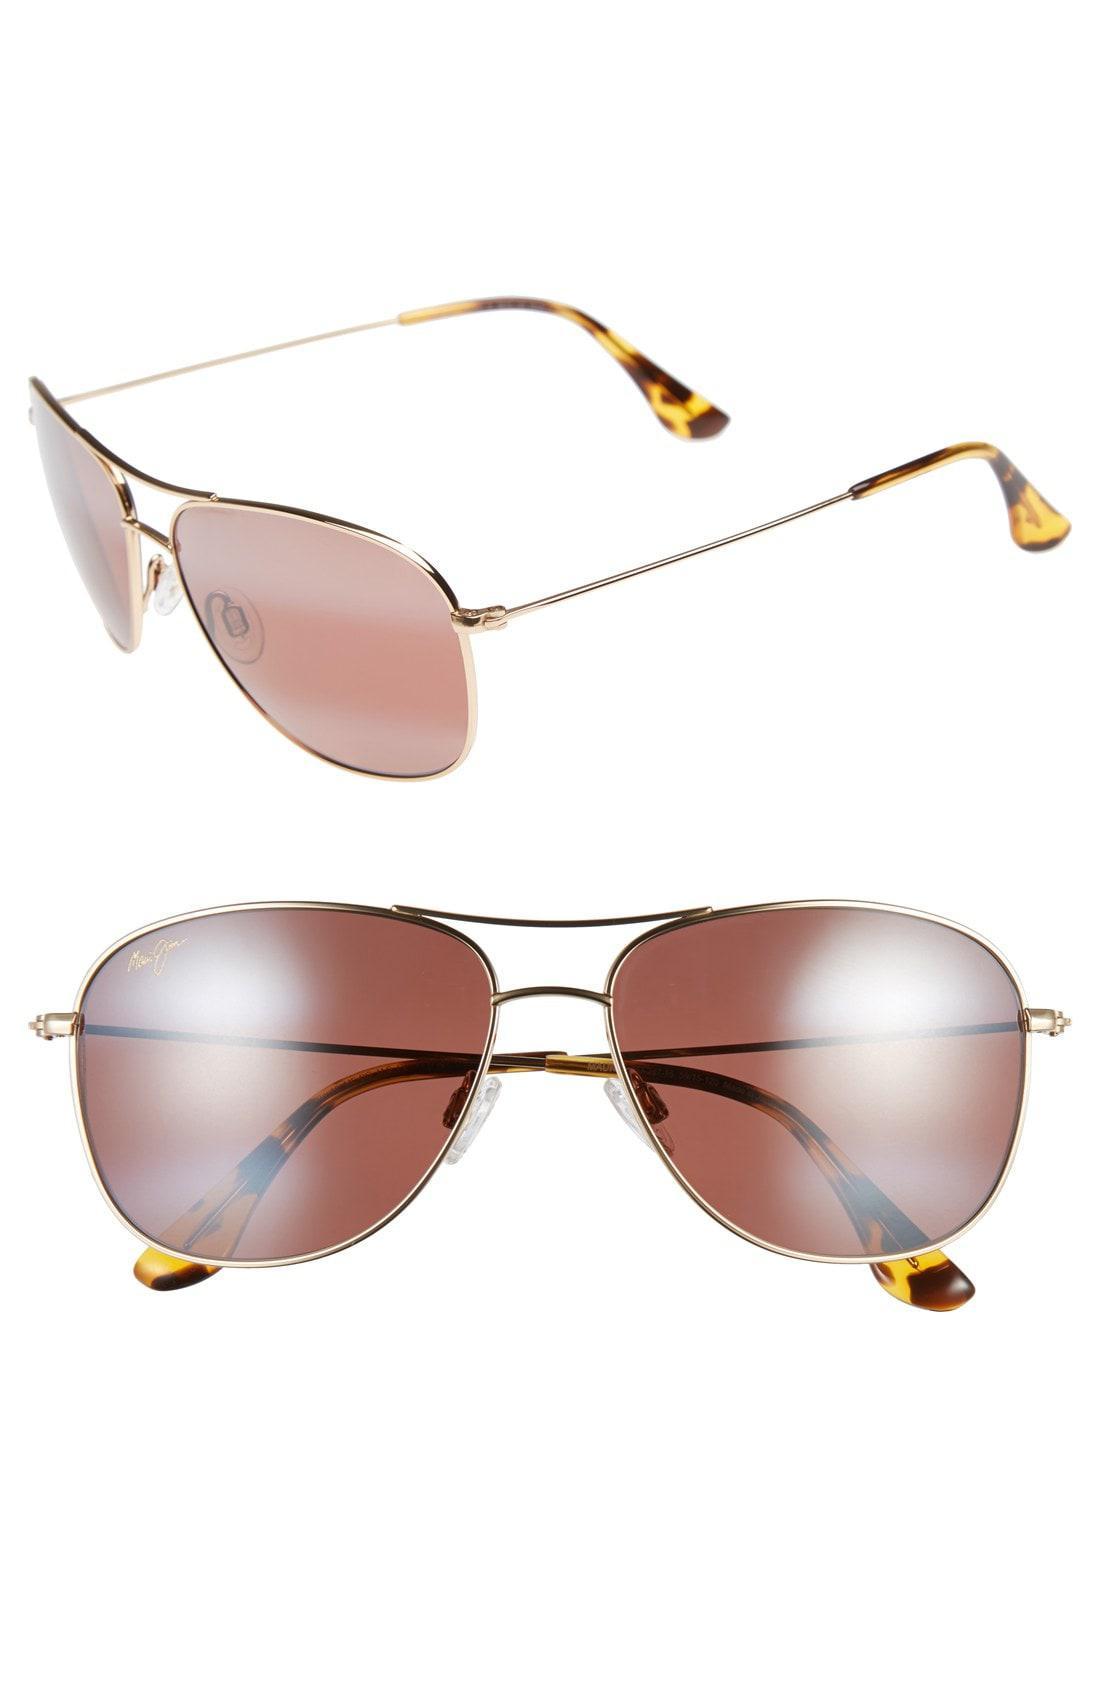 f4f5441b400 Maui Jim. Women s Metallic Cliff House 59mm Polarizedplus2 Metal Aviator  Sunglasses